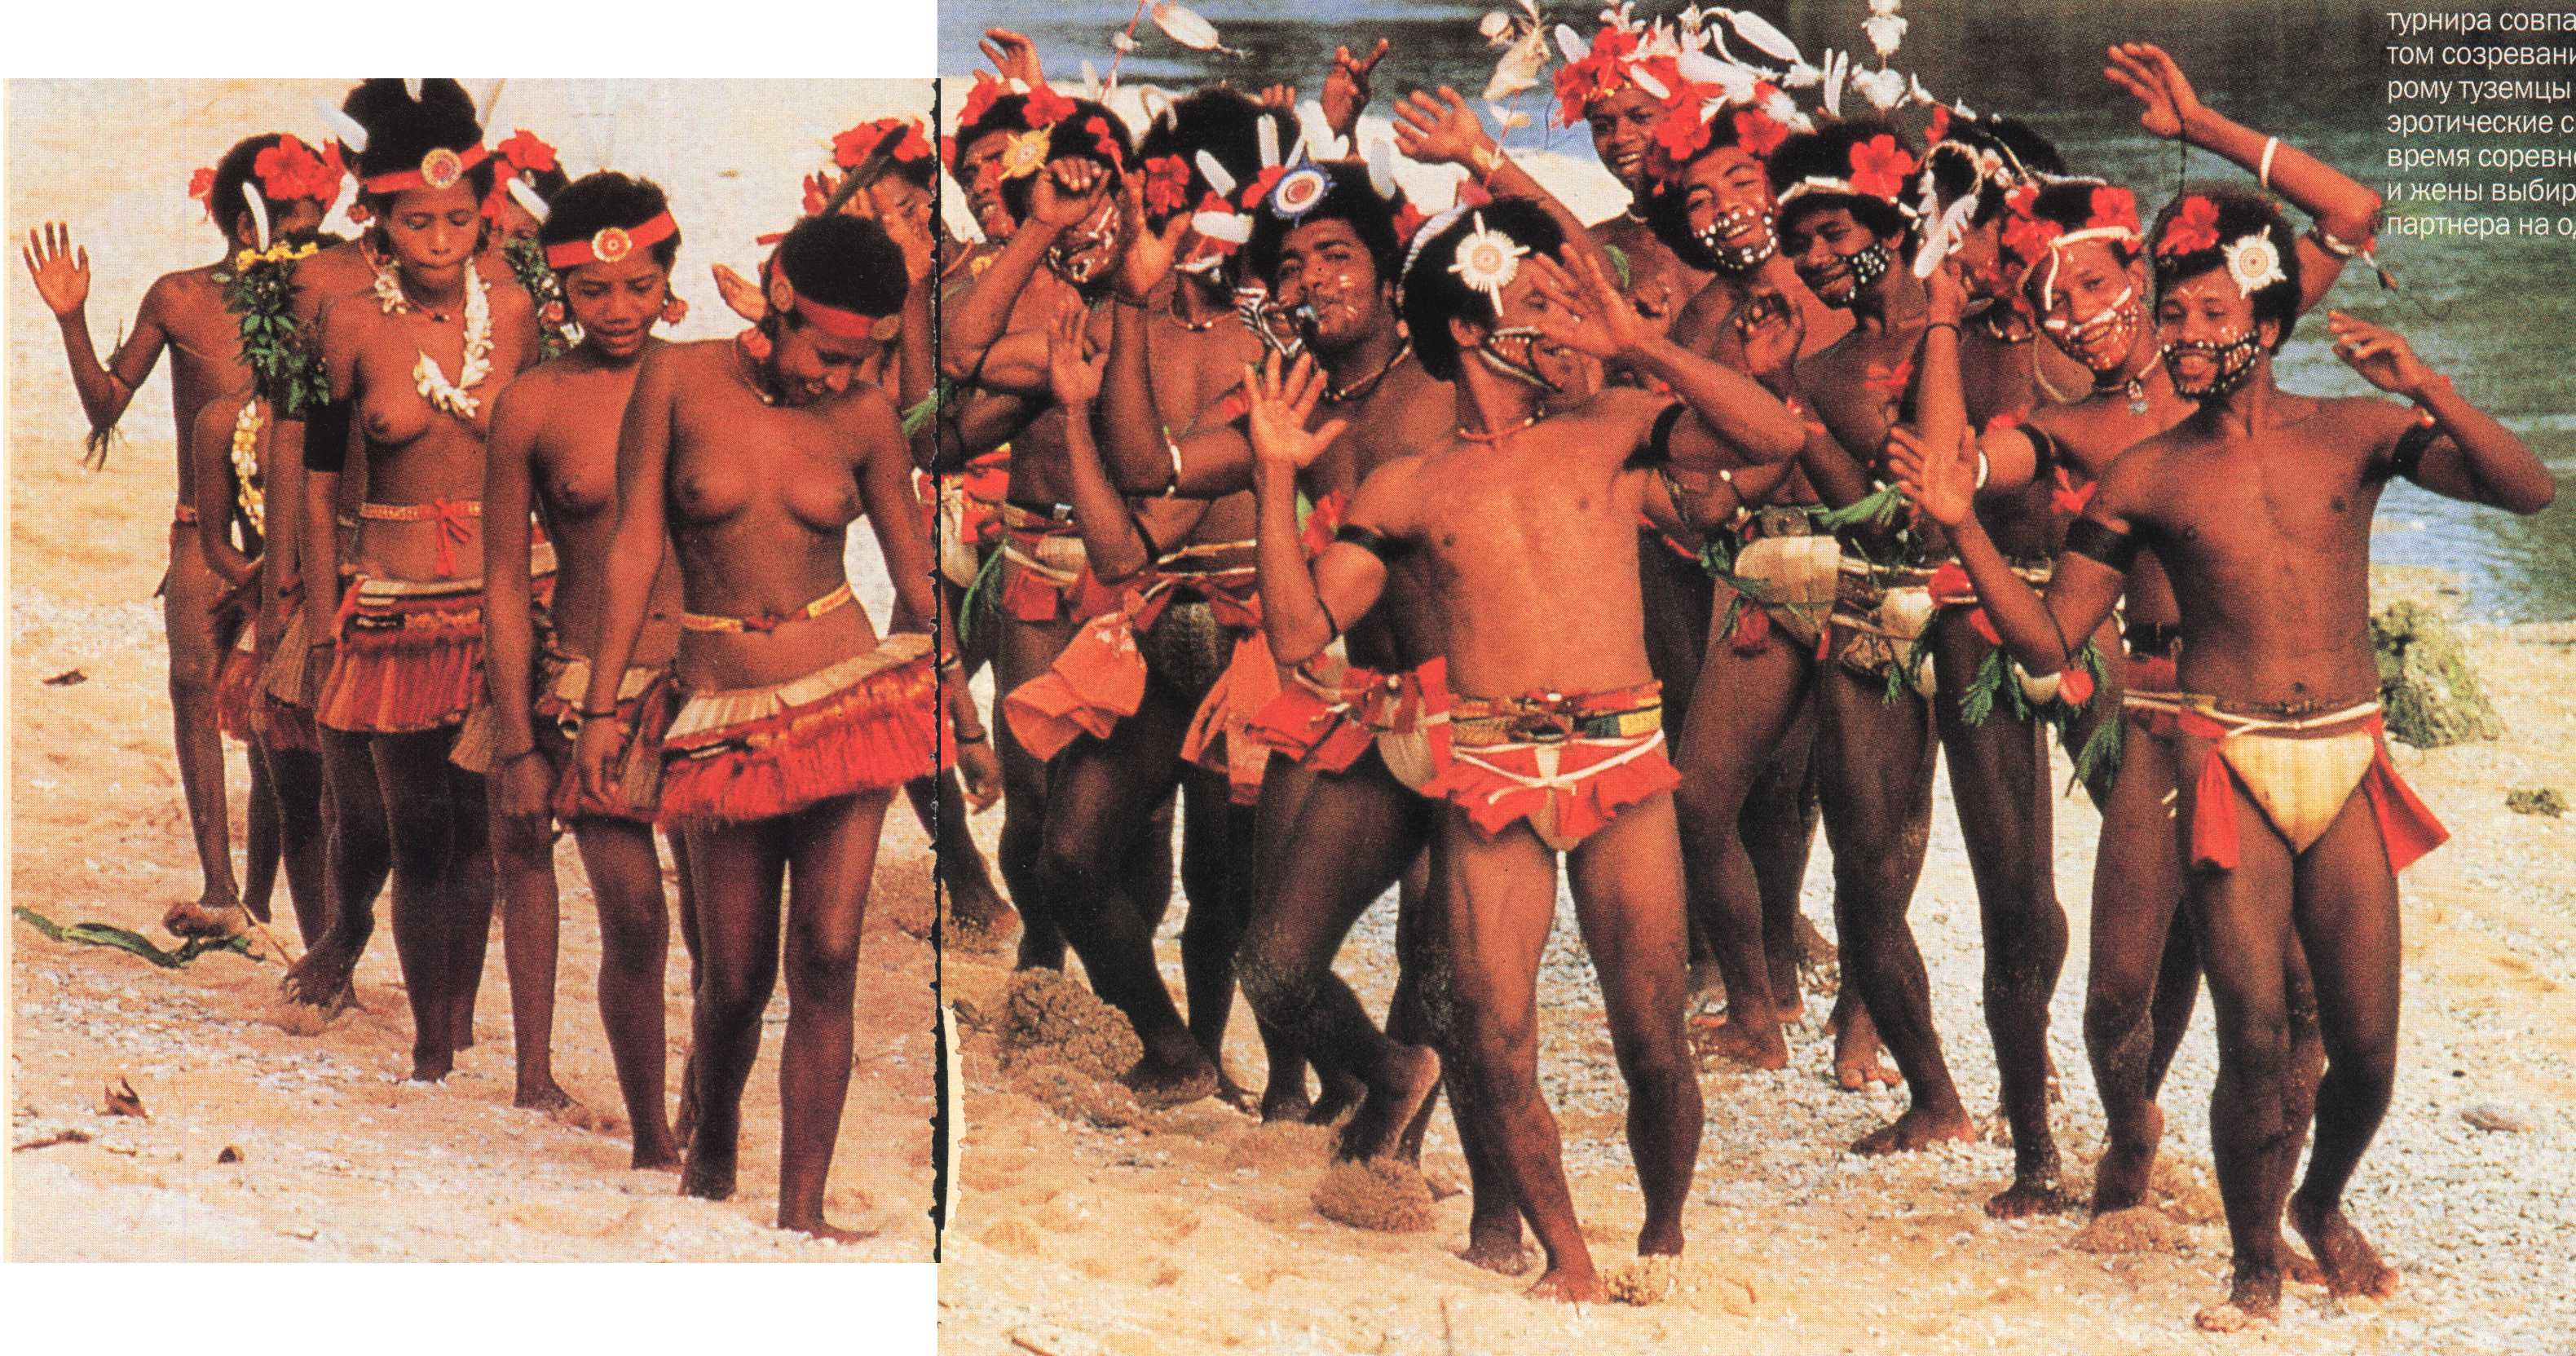 Секс с аборигенами африки